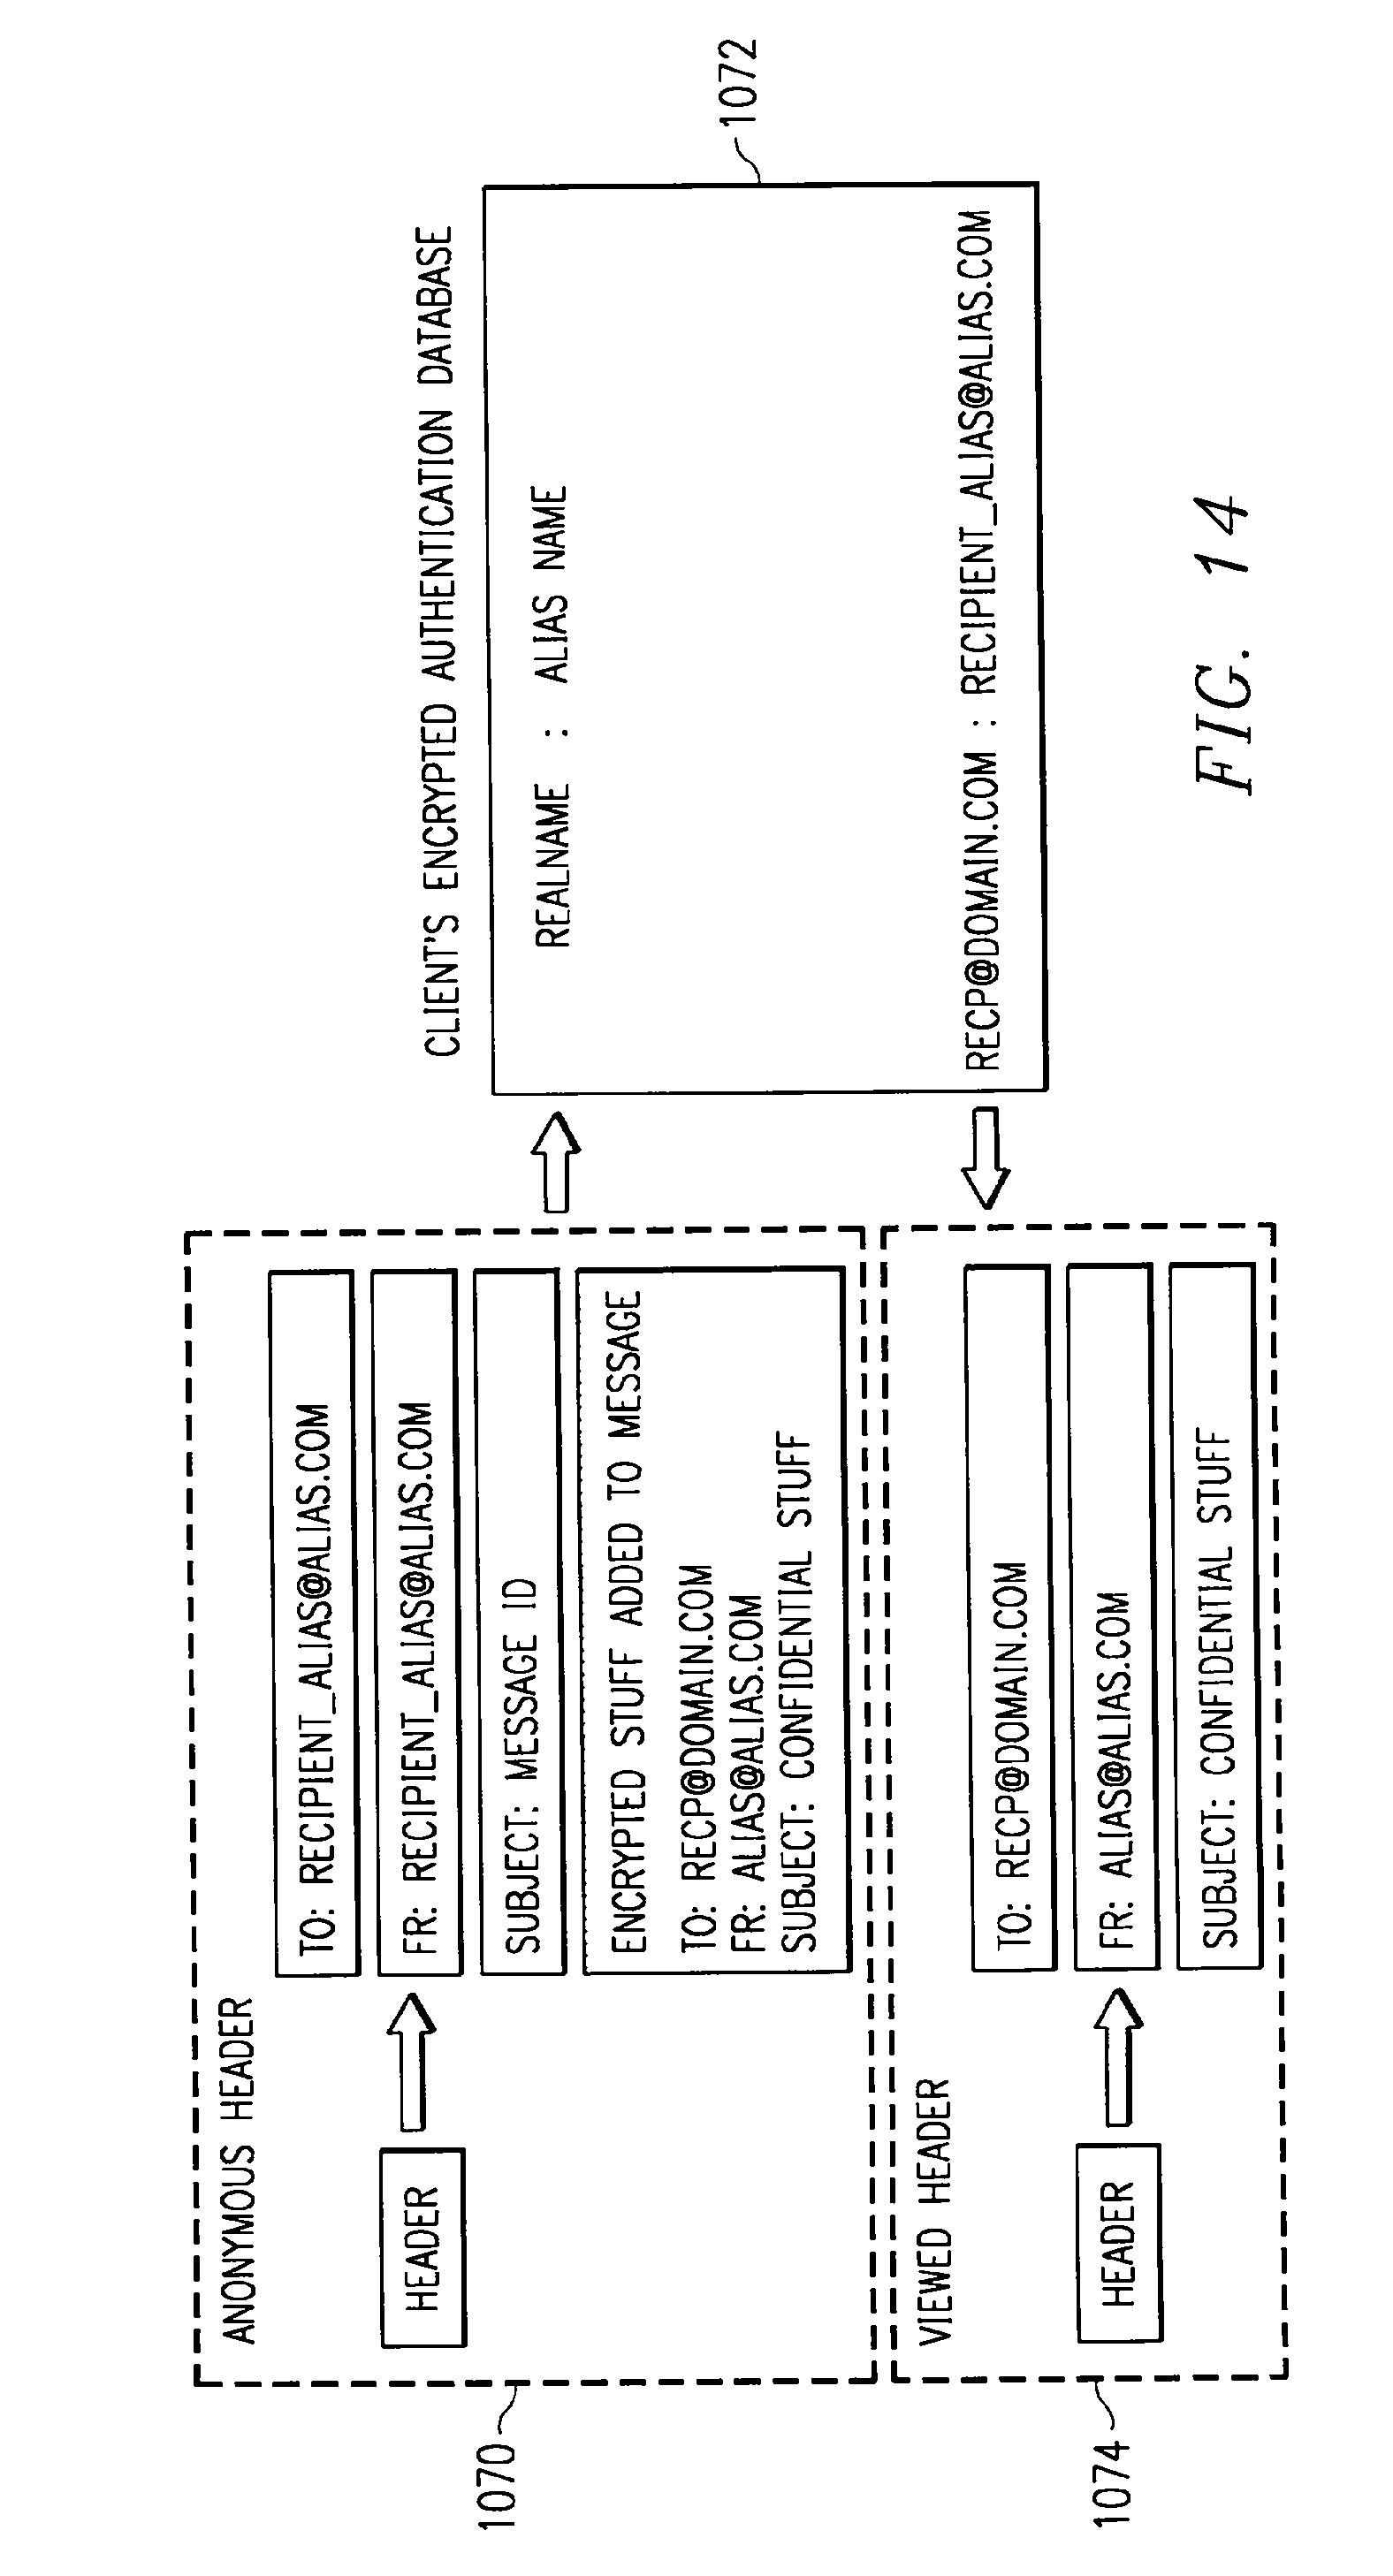 Patent US 9,935,814 B2